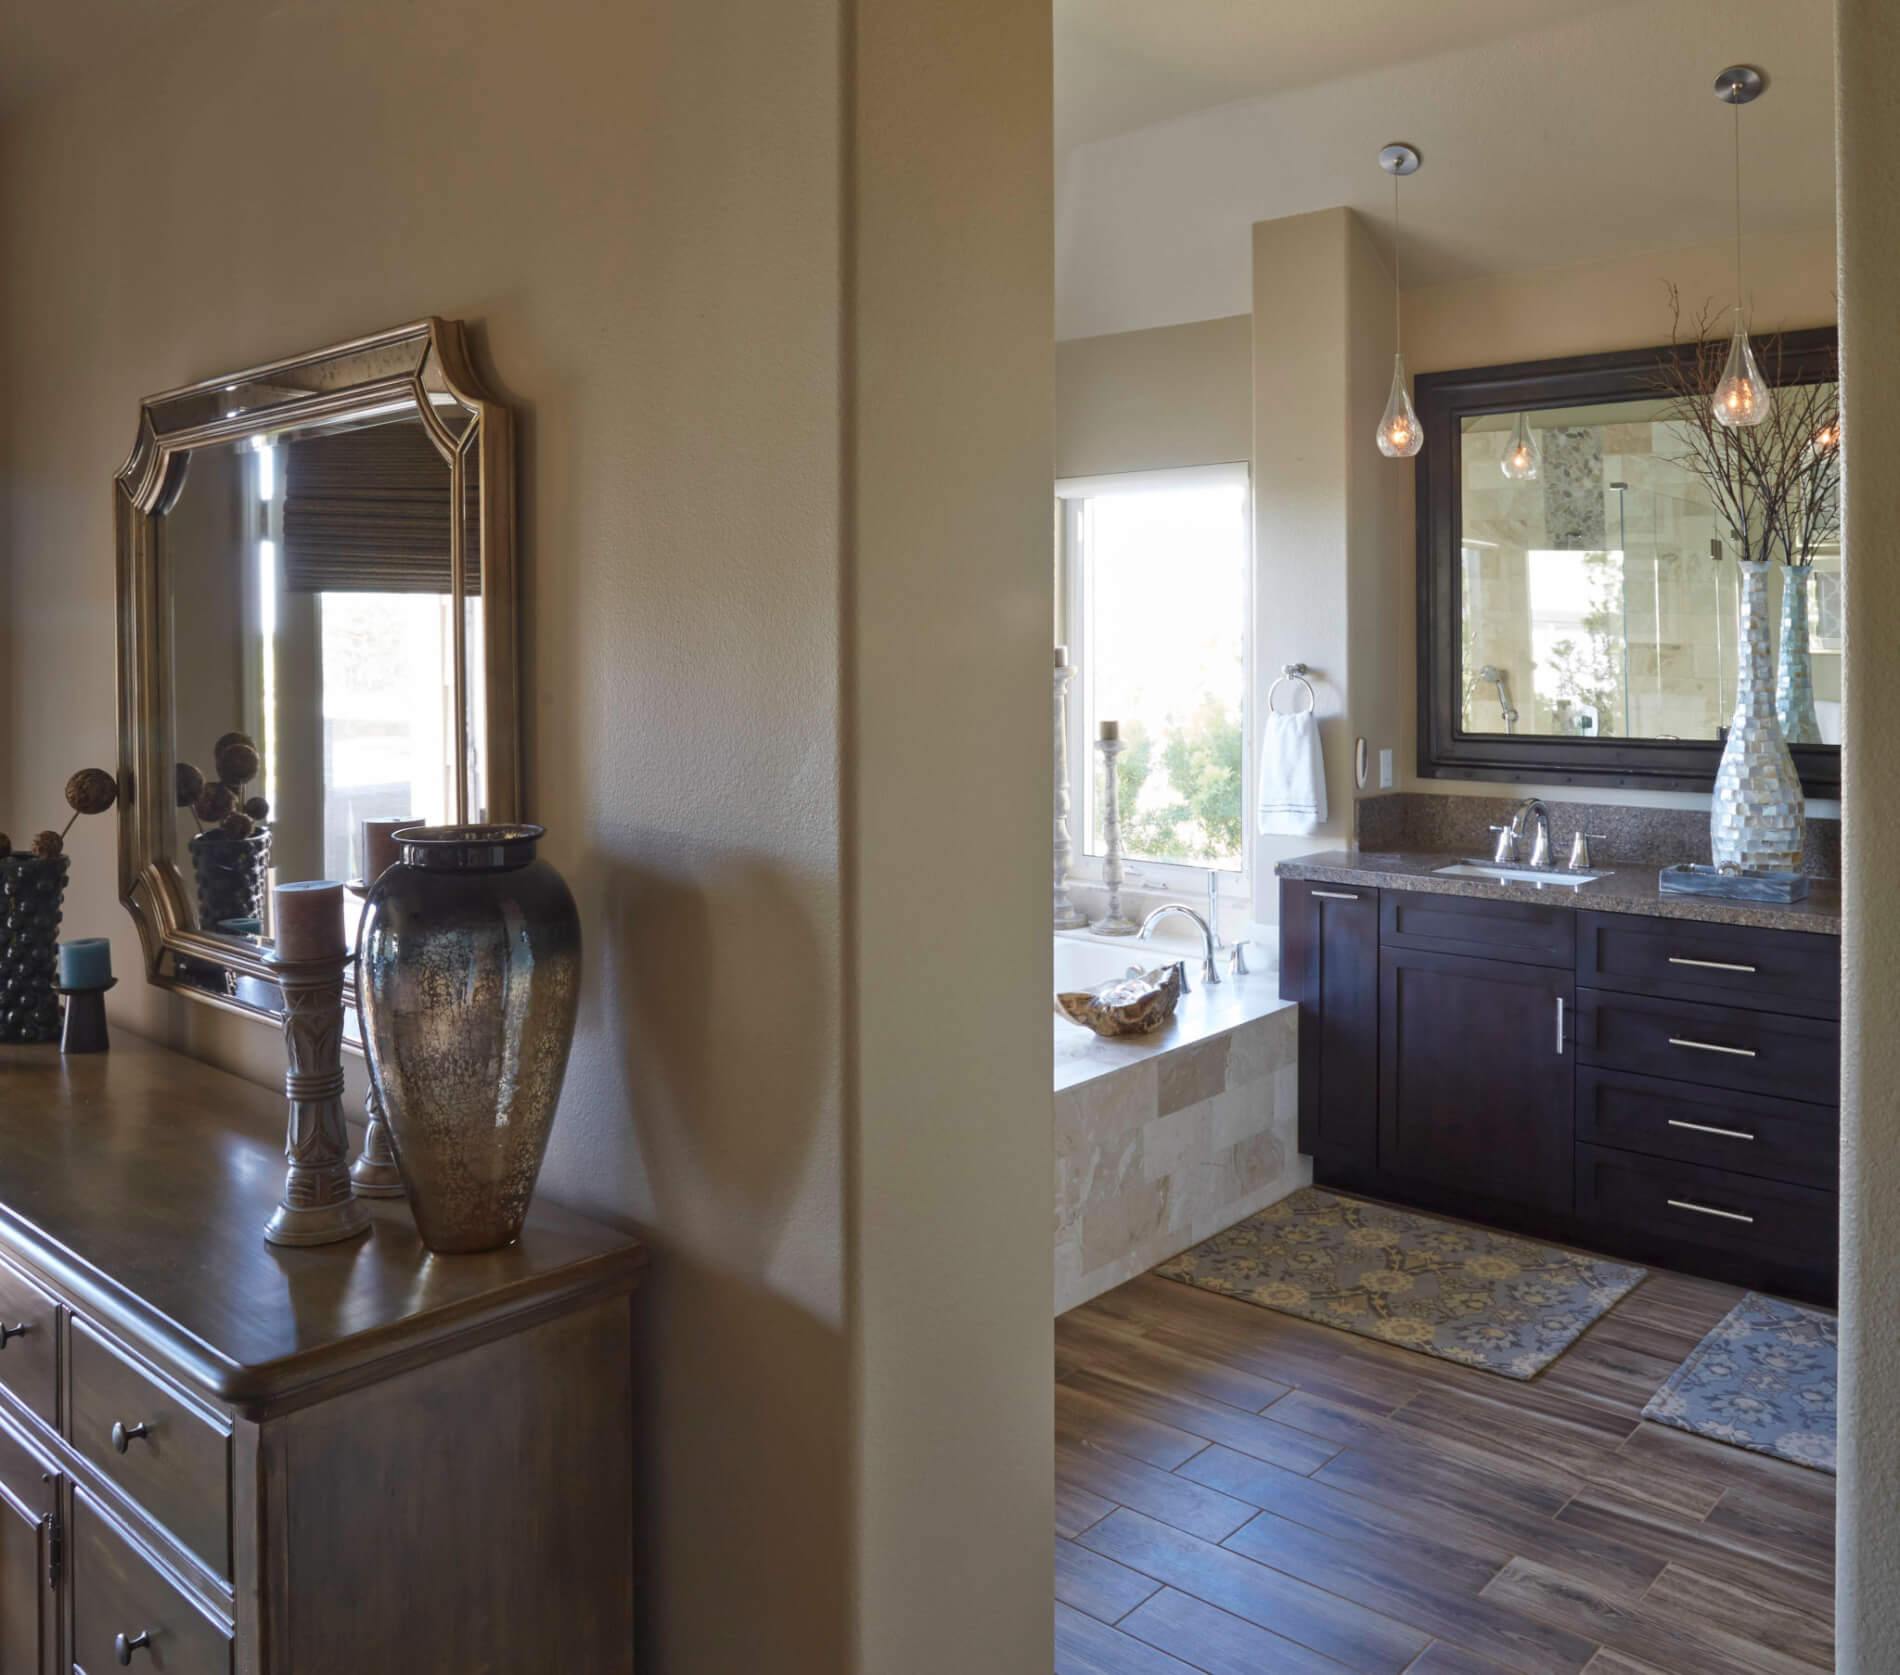 Large Bathroom Remodel Ladera Ranch, Large Bathroom Remodel Laguna Beach, Large Bathroom Remodeling Companies